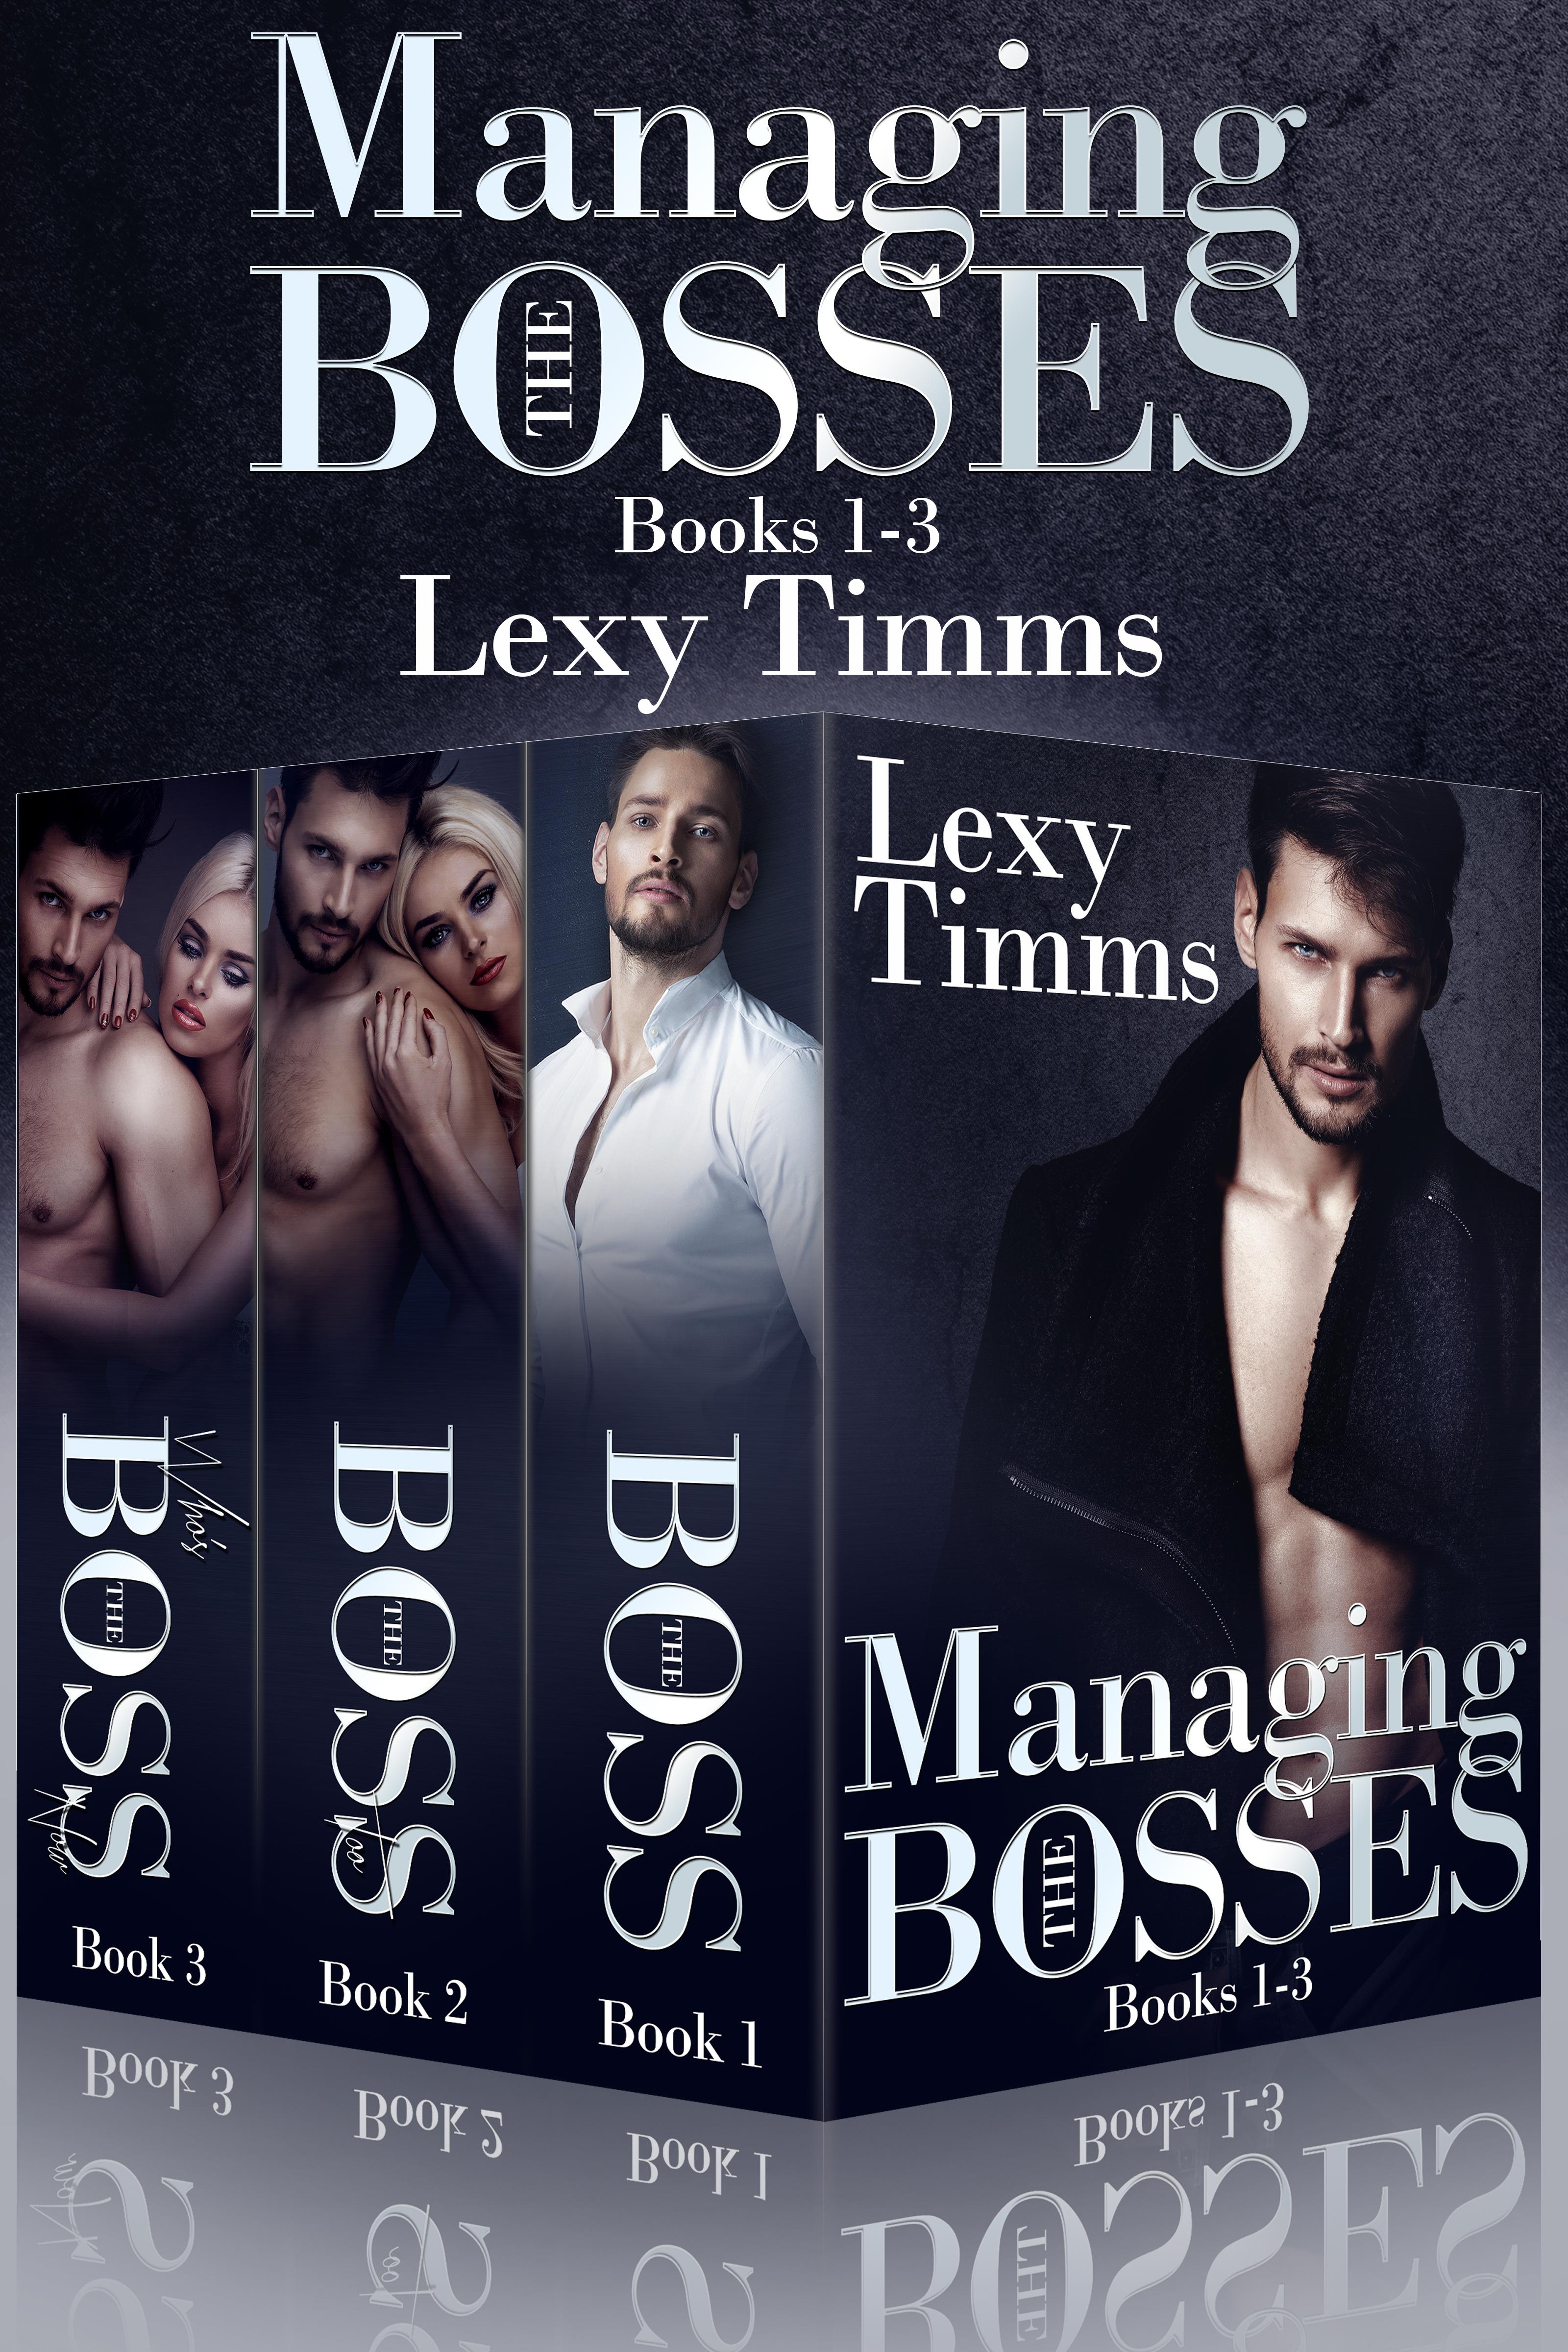 Managing the bosses - box set - books #1-3